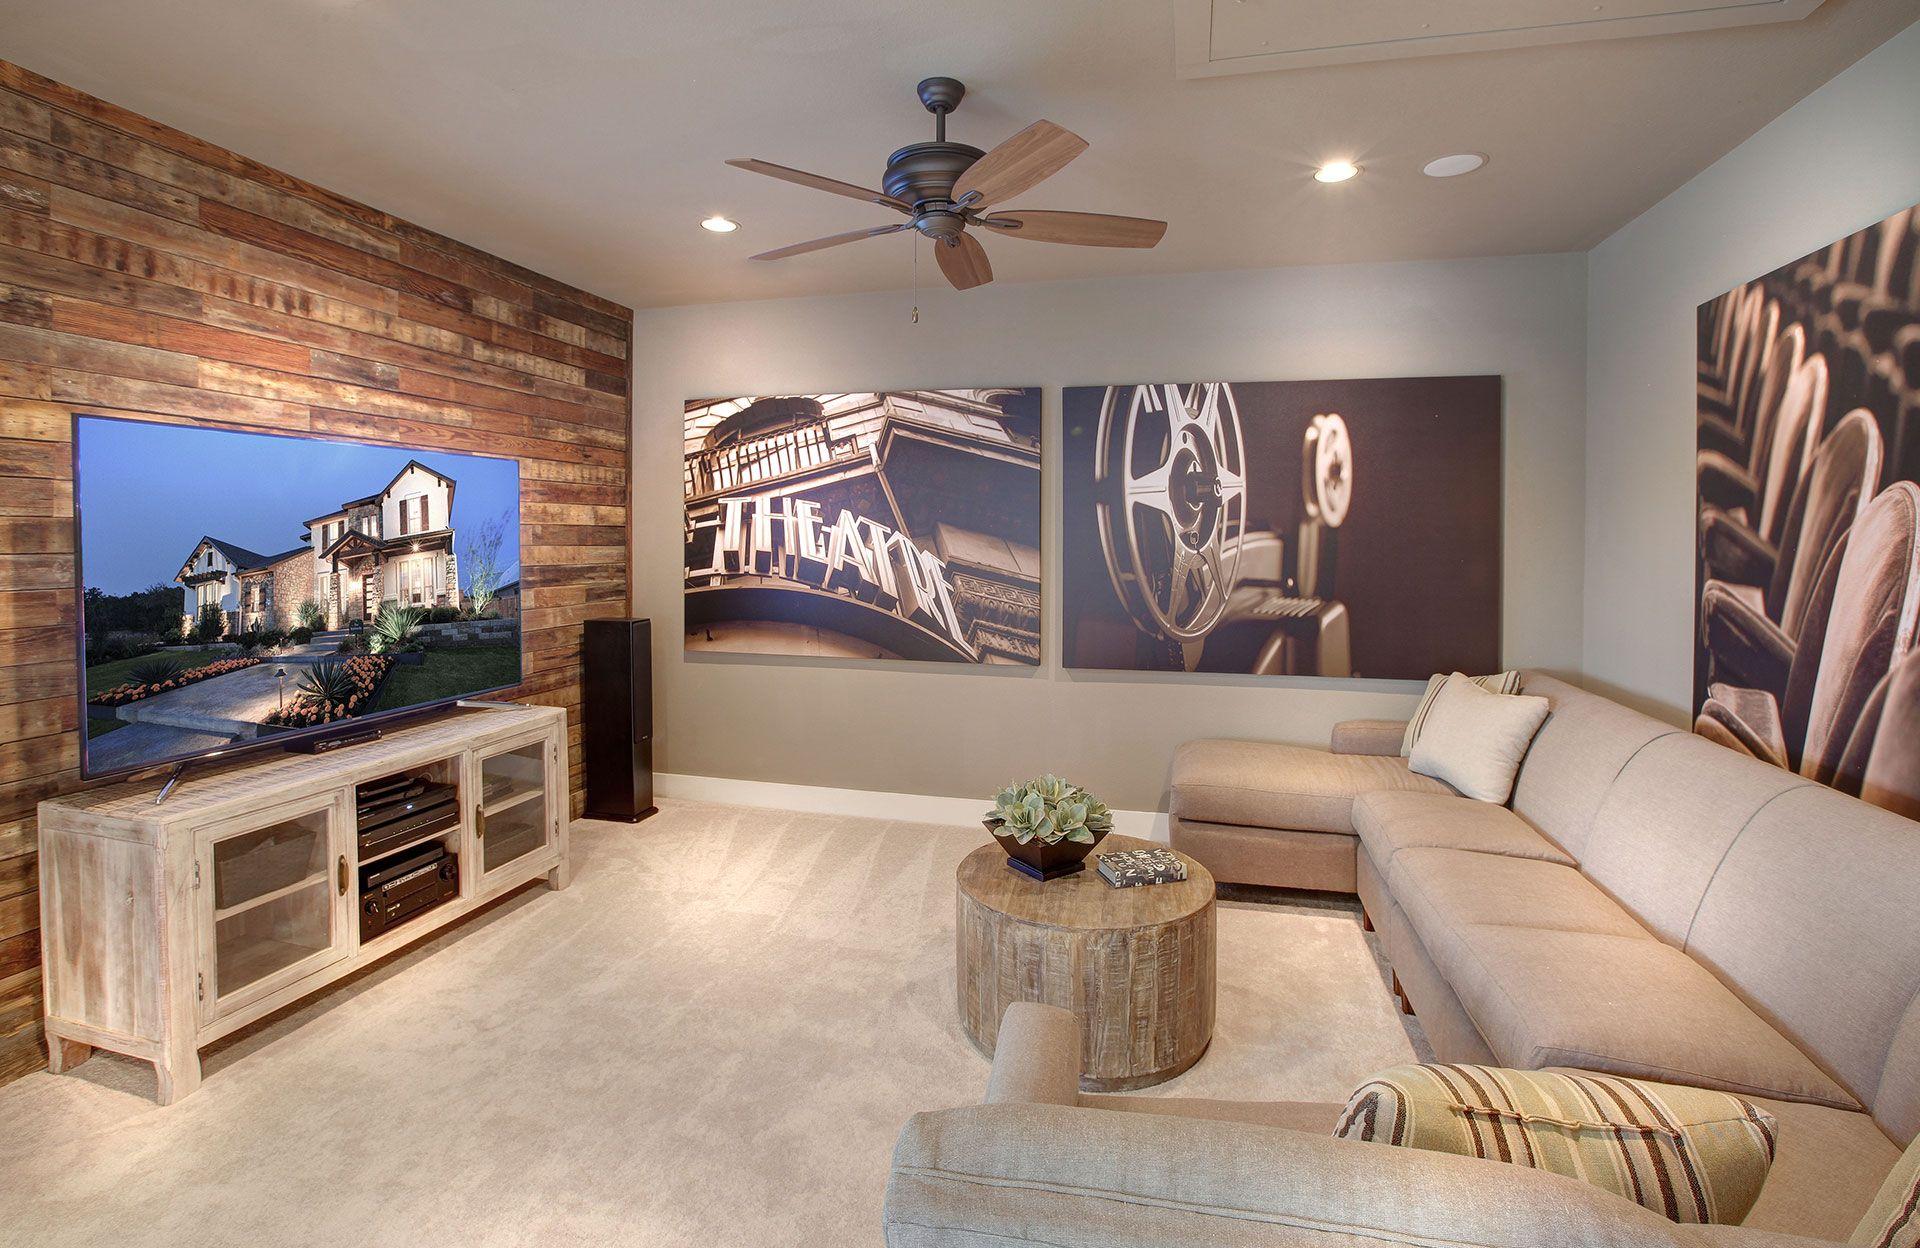 Single Family for Sale at Ensenada Ii 207 Seneca Drive Austin, Texas 78737 United States